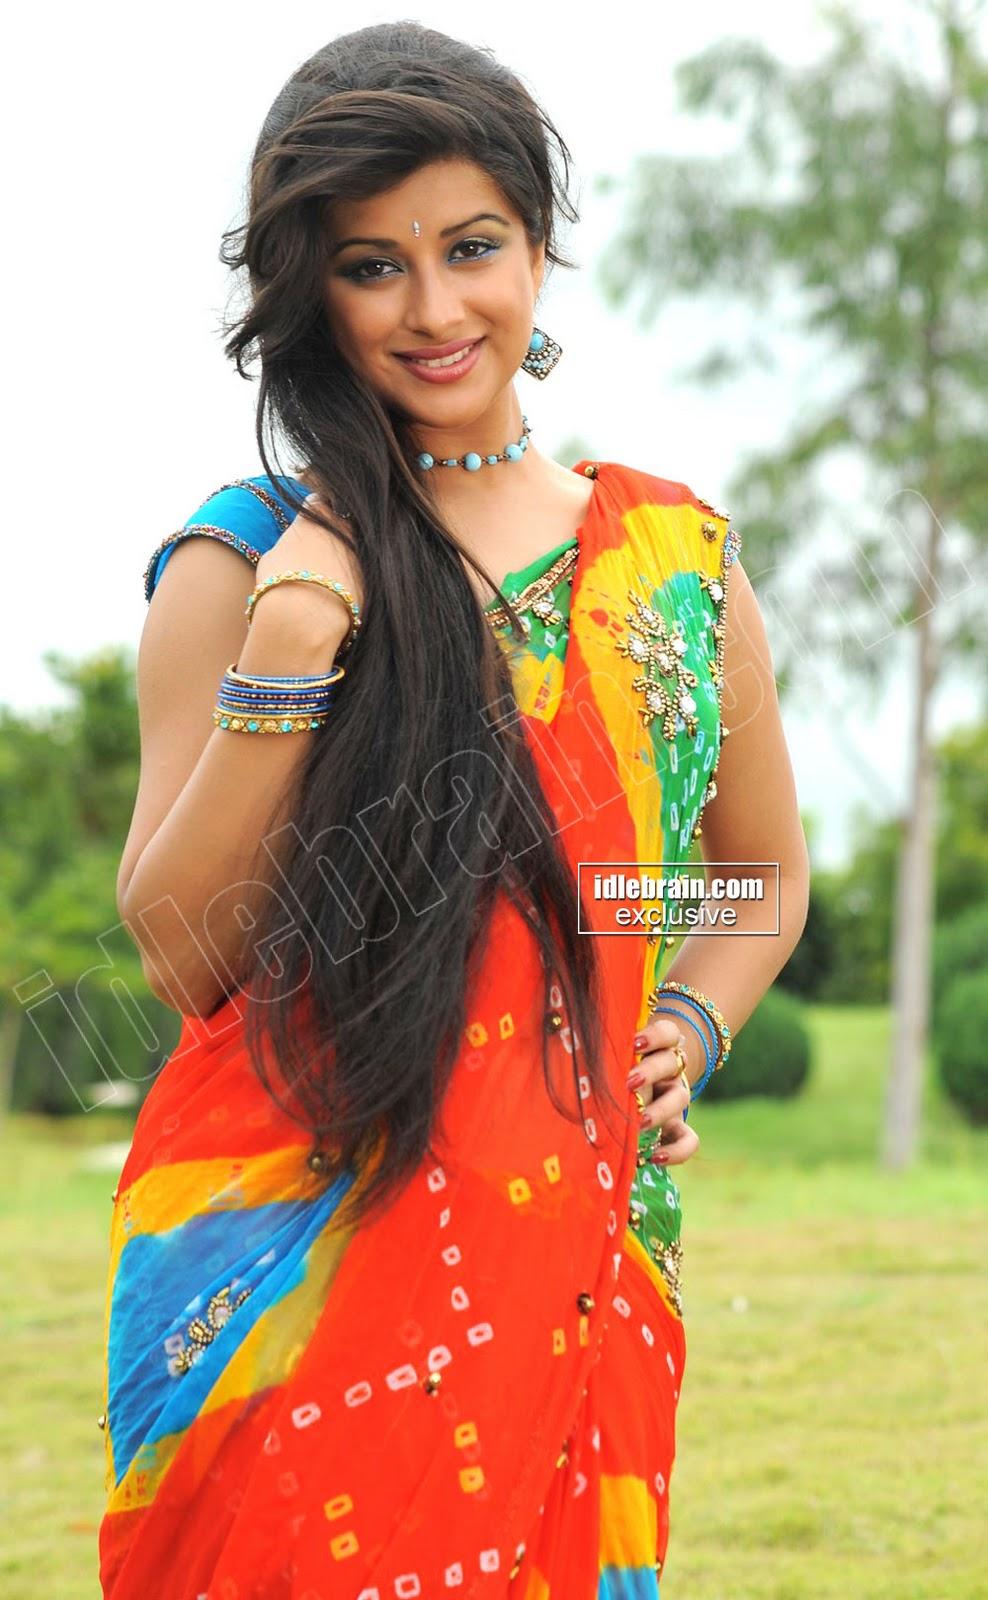 madhurima looks seductive in saree beautiful older women